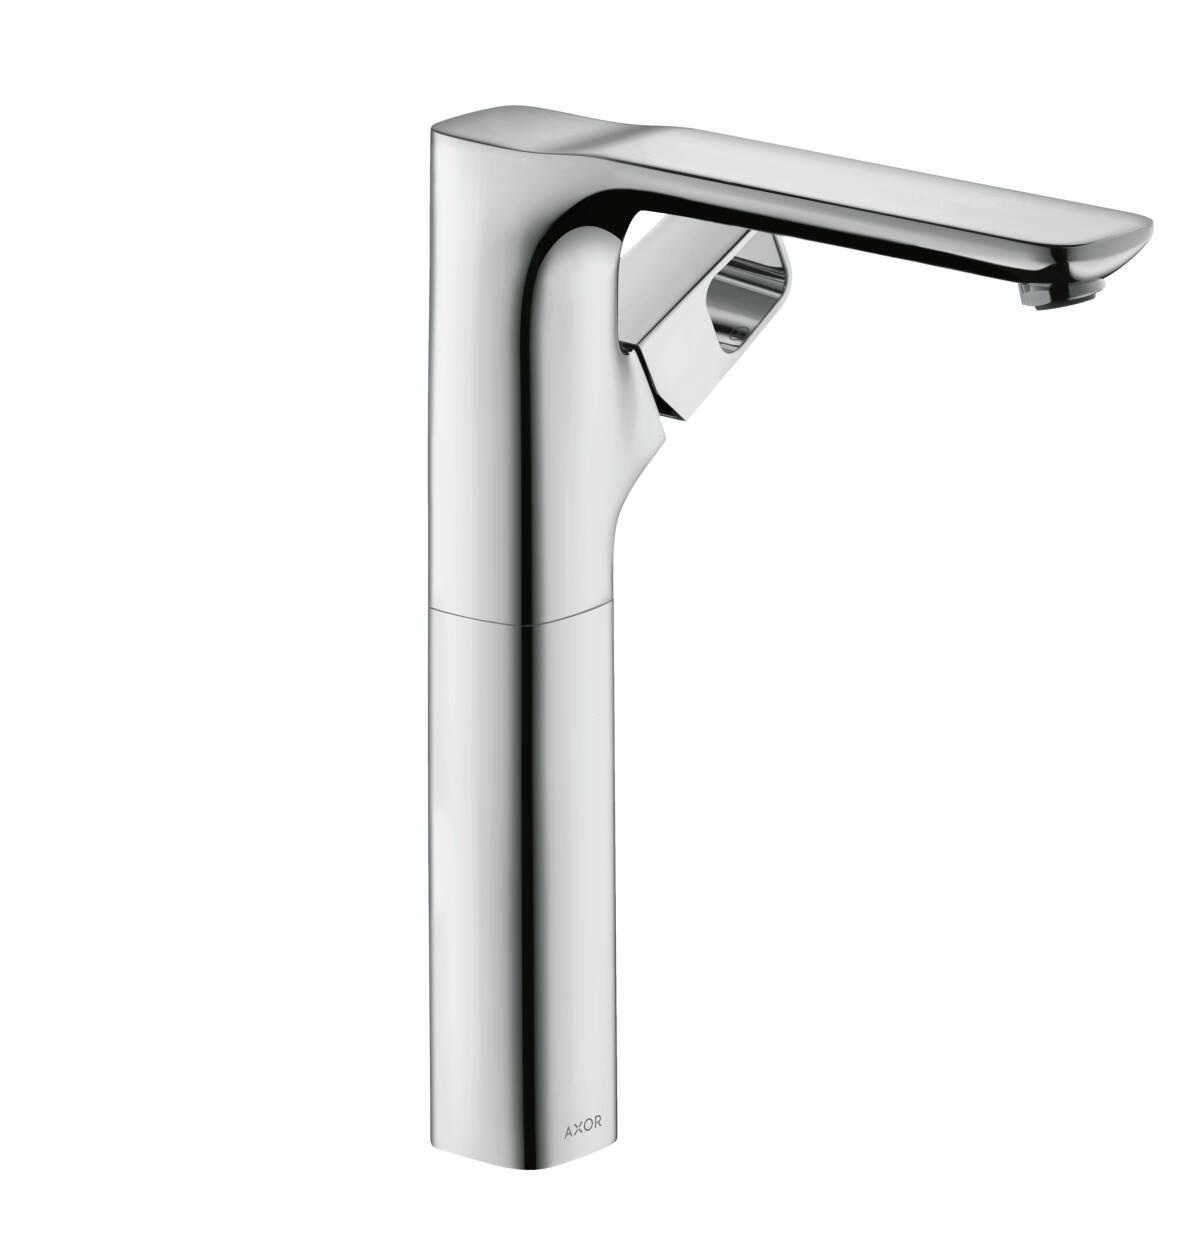 Single lever basin mixer 280 for washbowls with waste set, Polished Chrome, 11035020